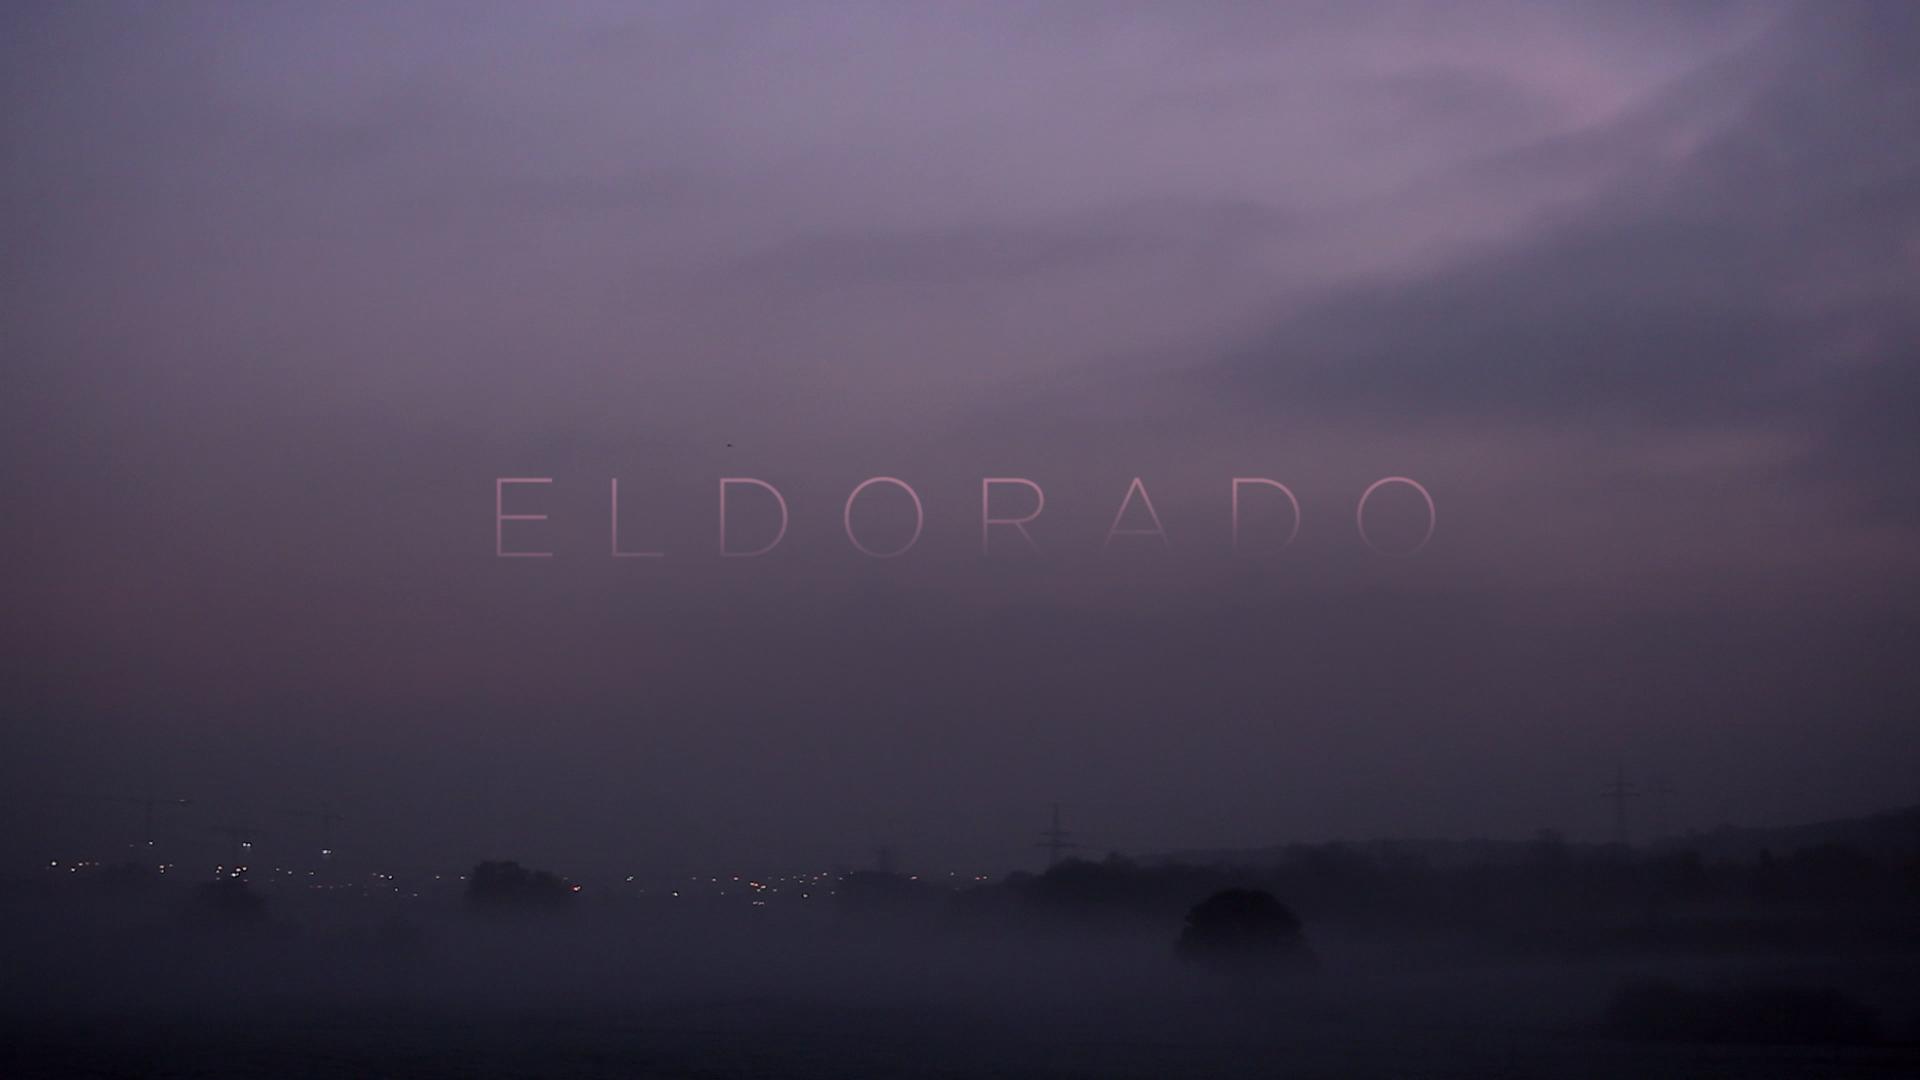 Eldorado – ©  Rui Abreu, Thierry Besseling, LoÏc Tanson / Samsa Film